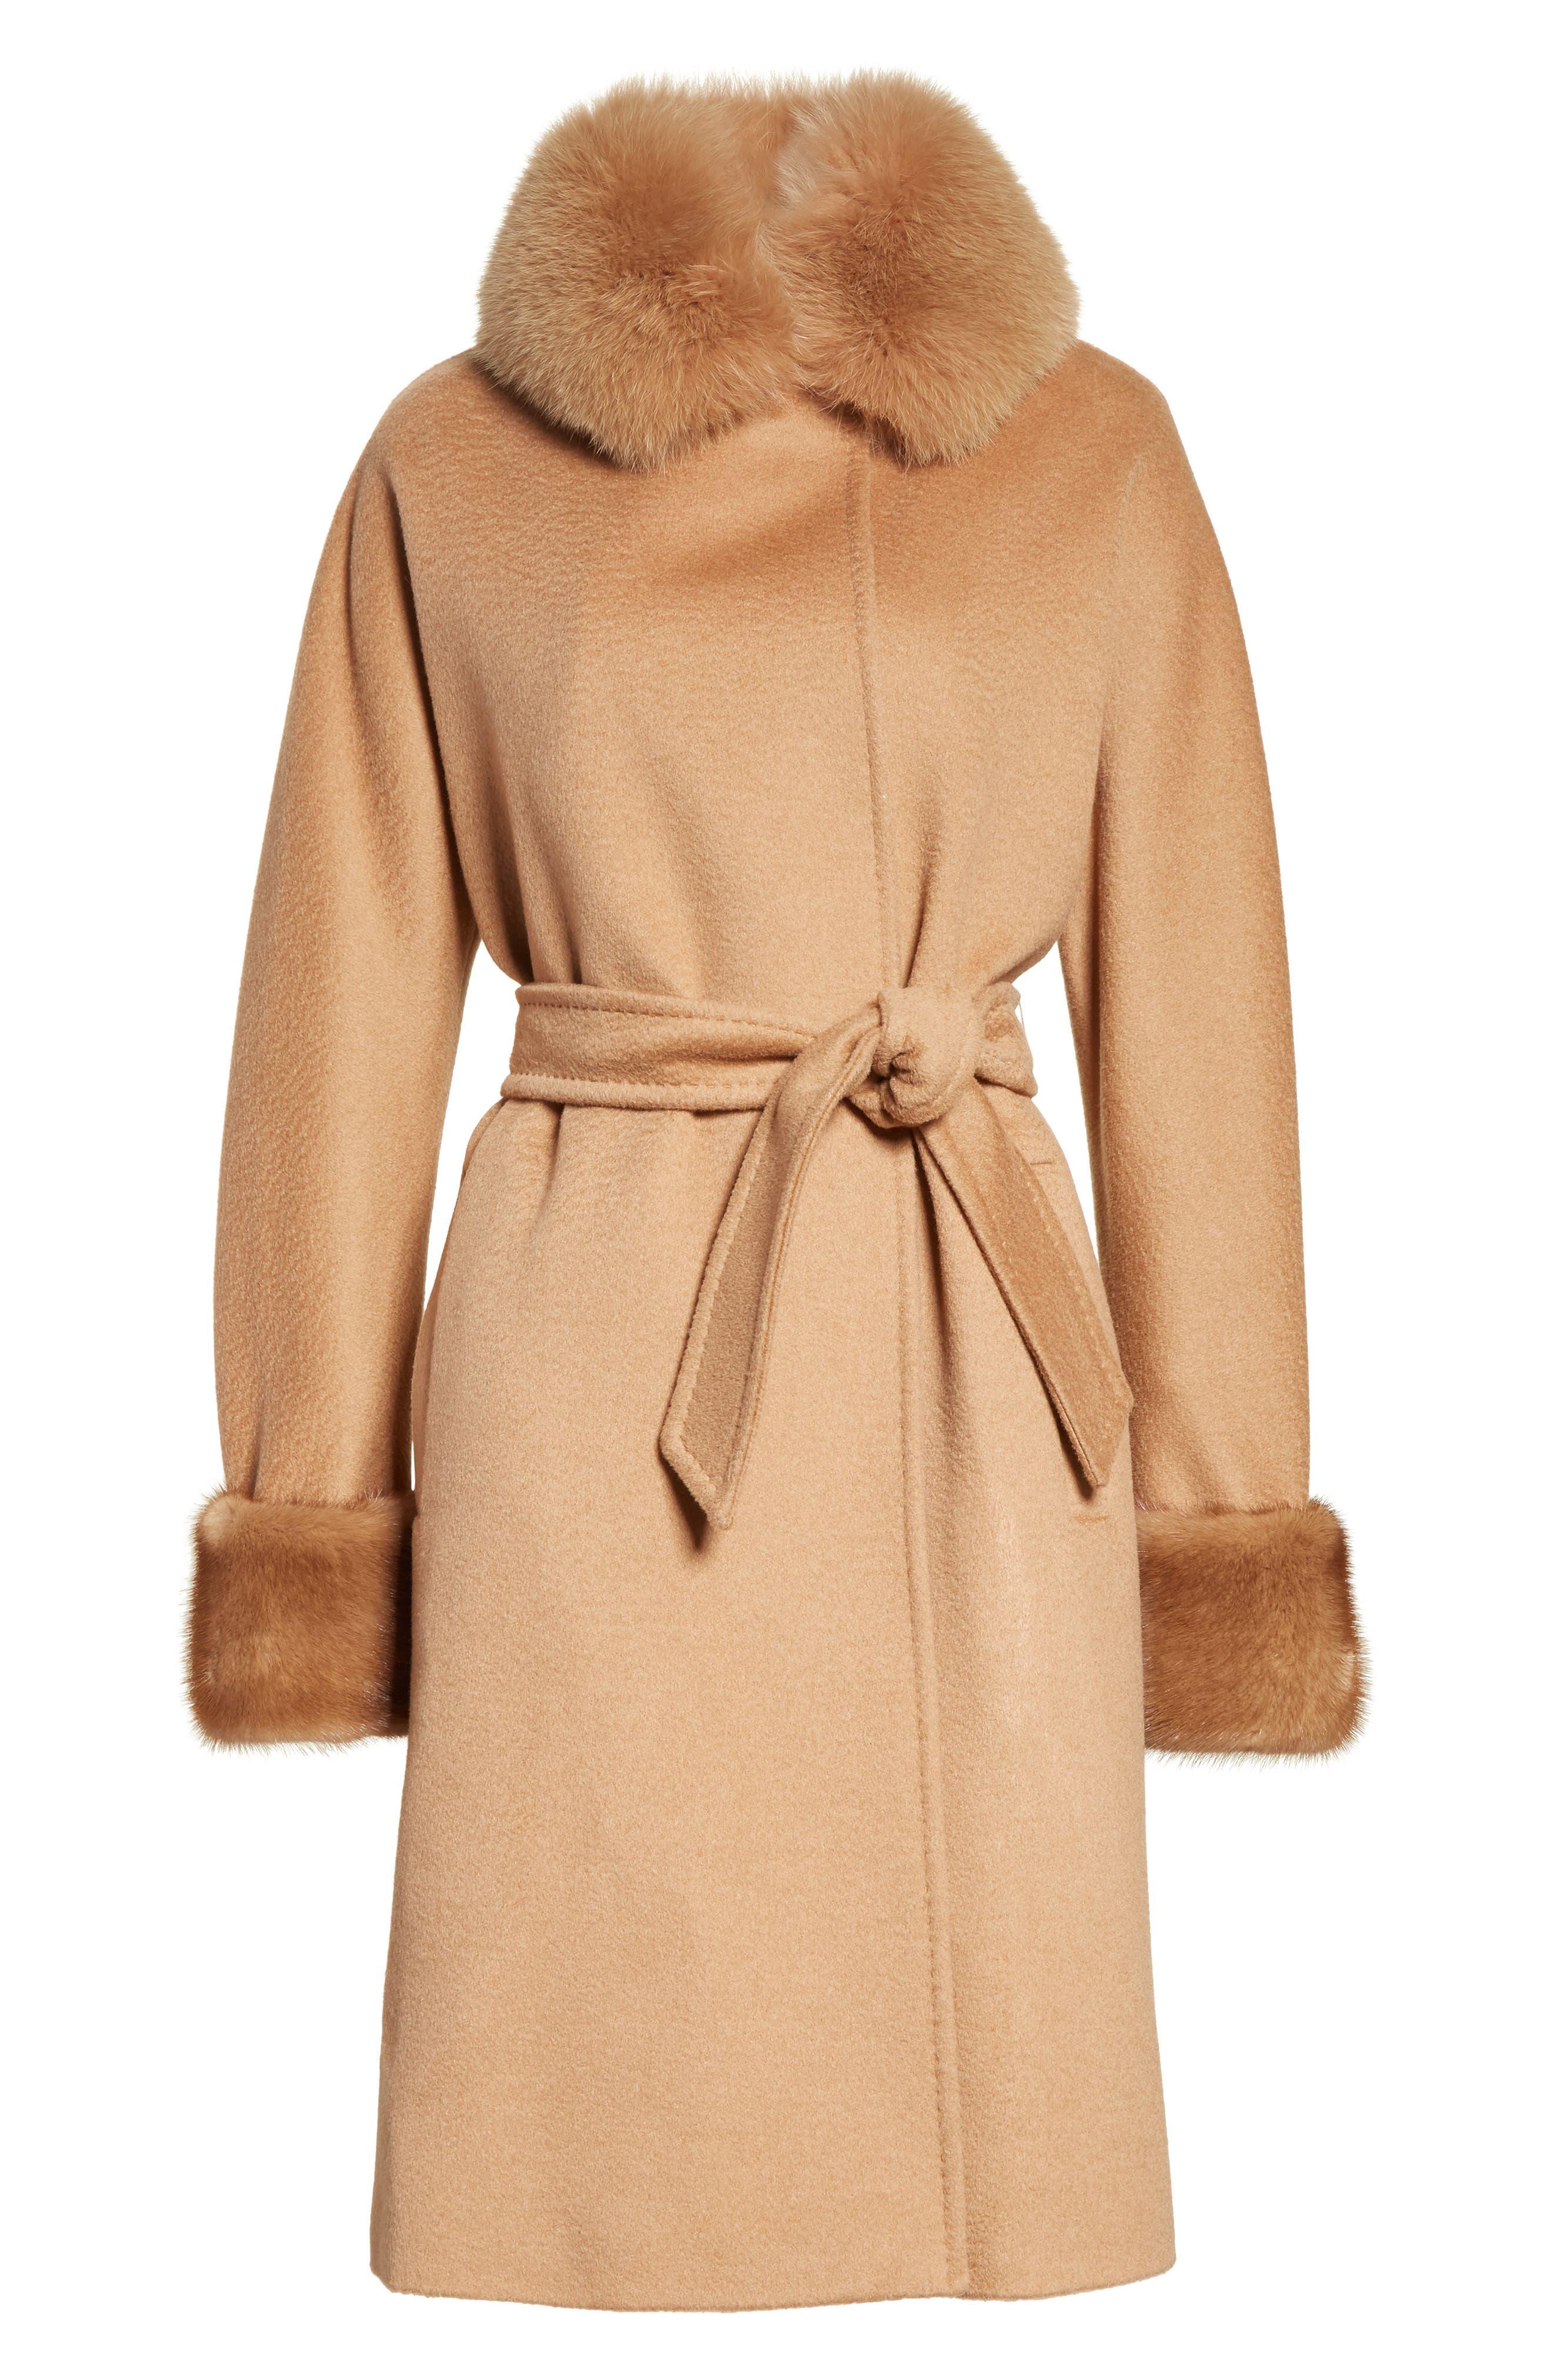 Camel Hair Coat with Genuine Fox Fur & Genuine Mink Fur Trim,                             Alternate thumbnail 5, color,                             232